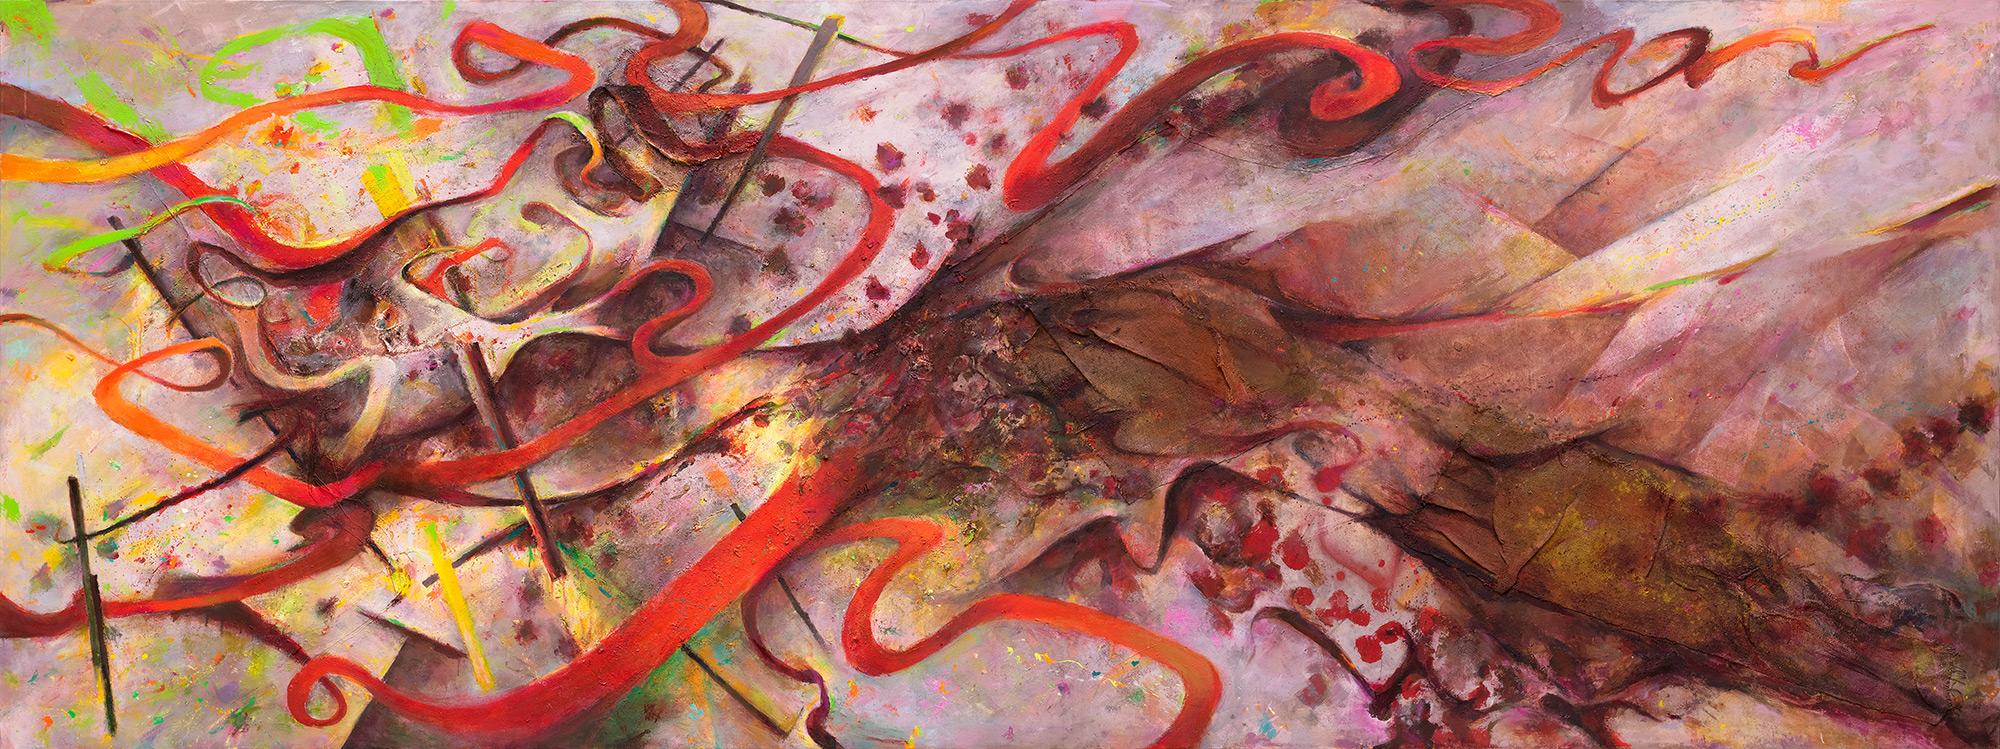 Tidal Surge III  2010-15, 168 x 457 cm